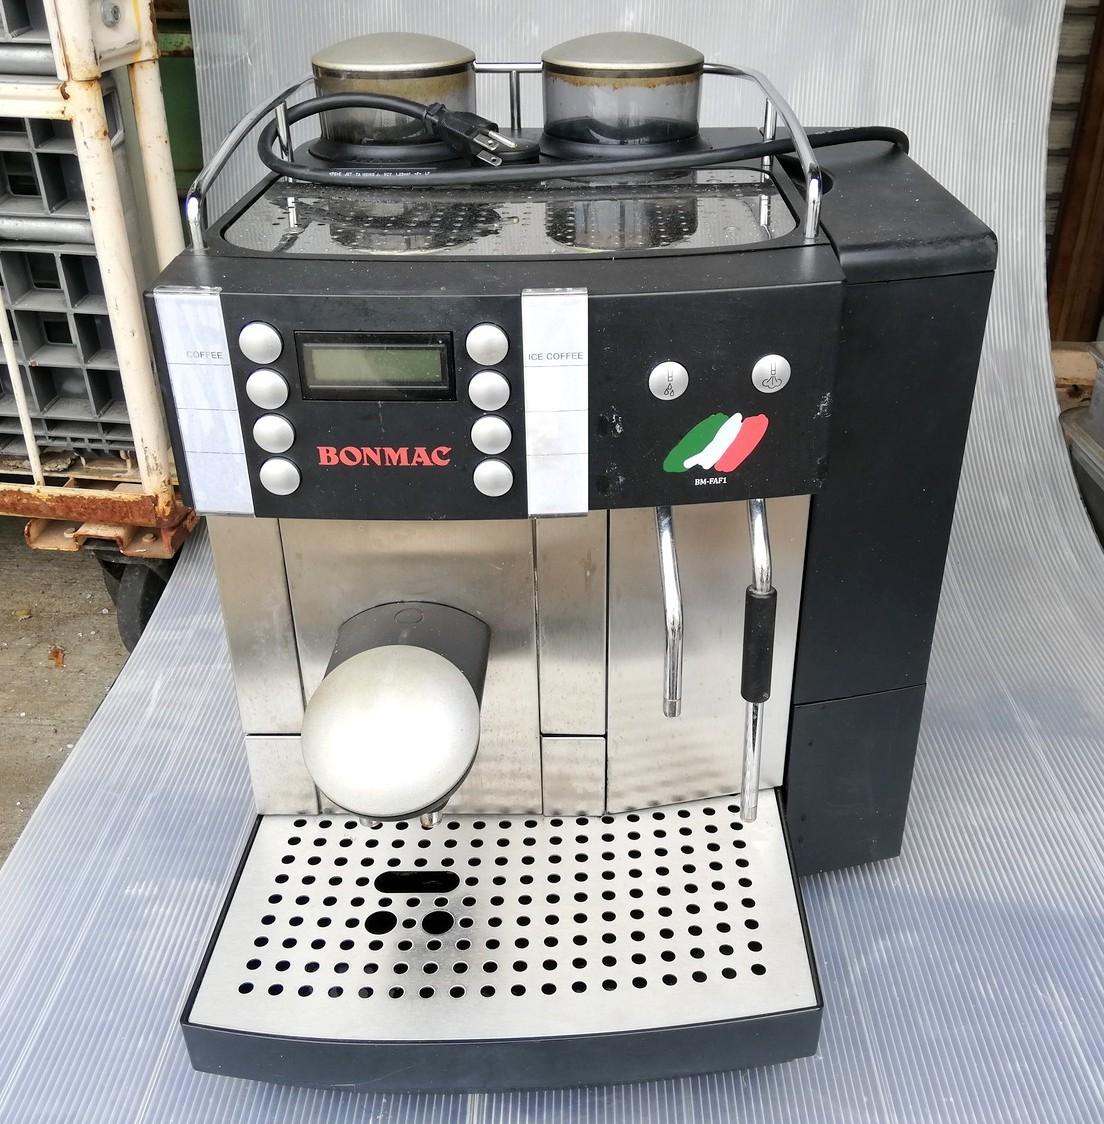 FR-1◆FRANKE フランケ Typ654 エスプレッソマシン 100V 通電確認済 コーヒーマシン / BONMAC BM-FAF1 ★引取歓迎(大阪)